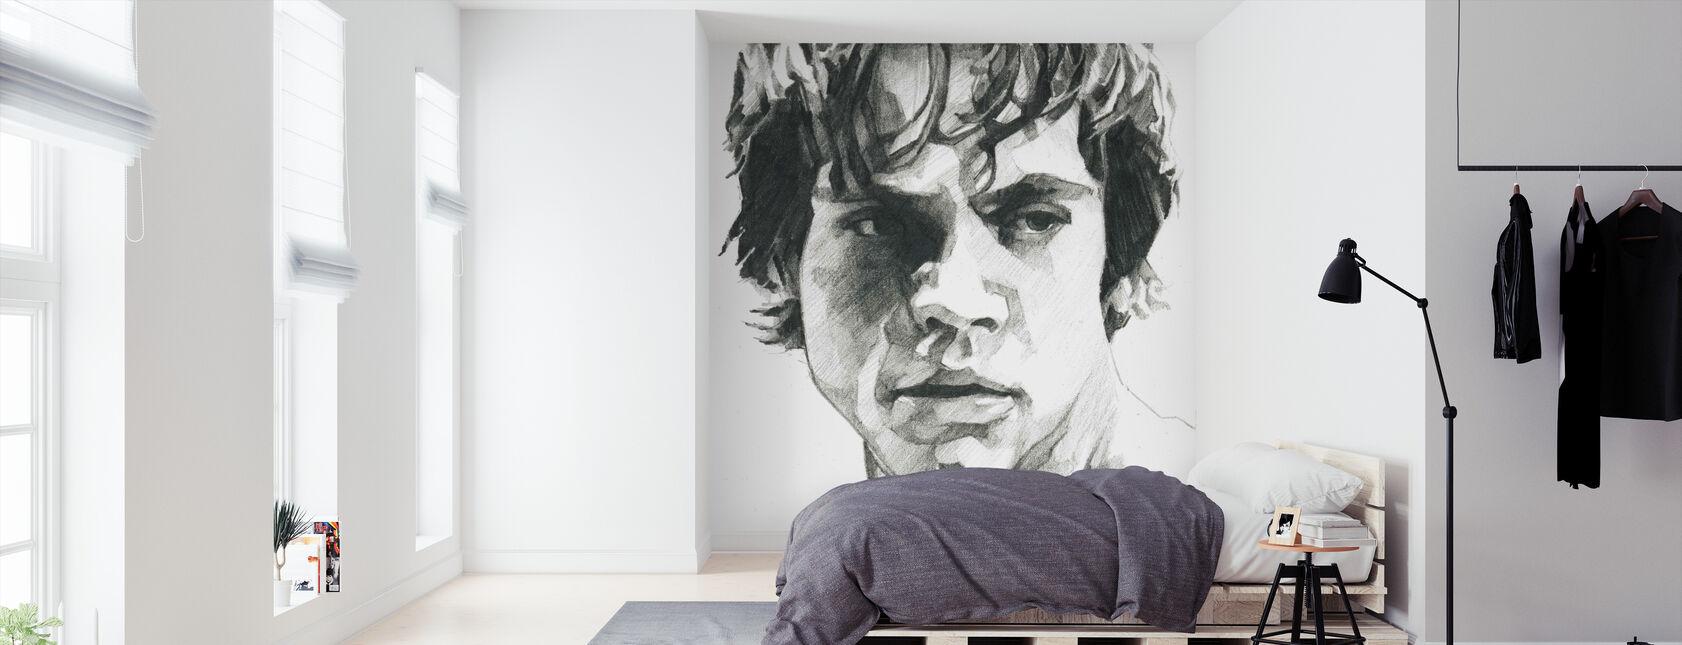 Star Wars - Luke Skywalker, colore: Grafite - Carta da parati - Camera da letto